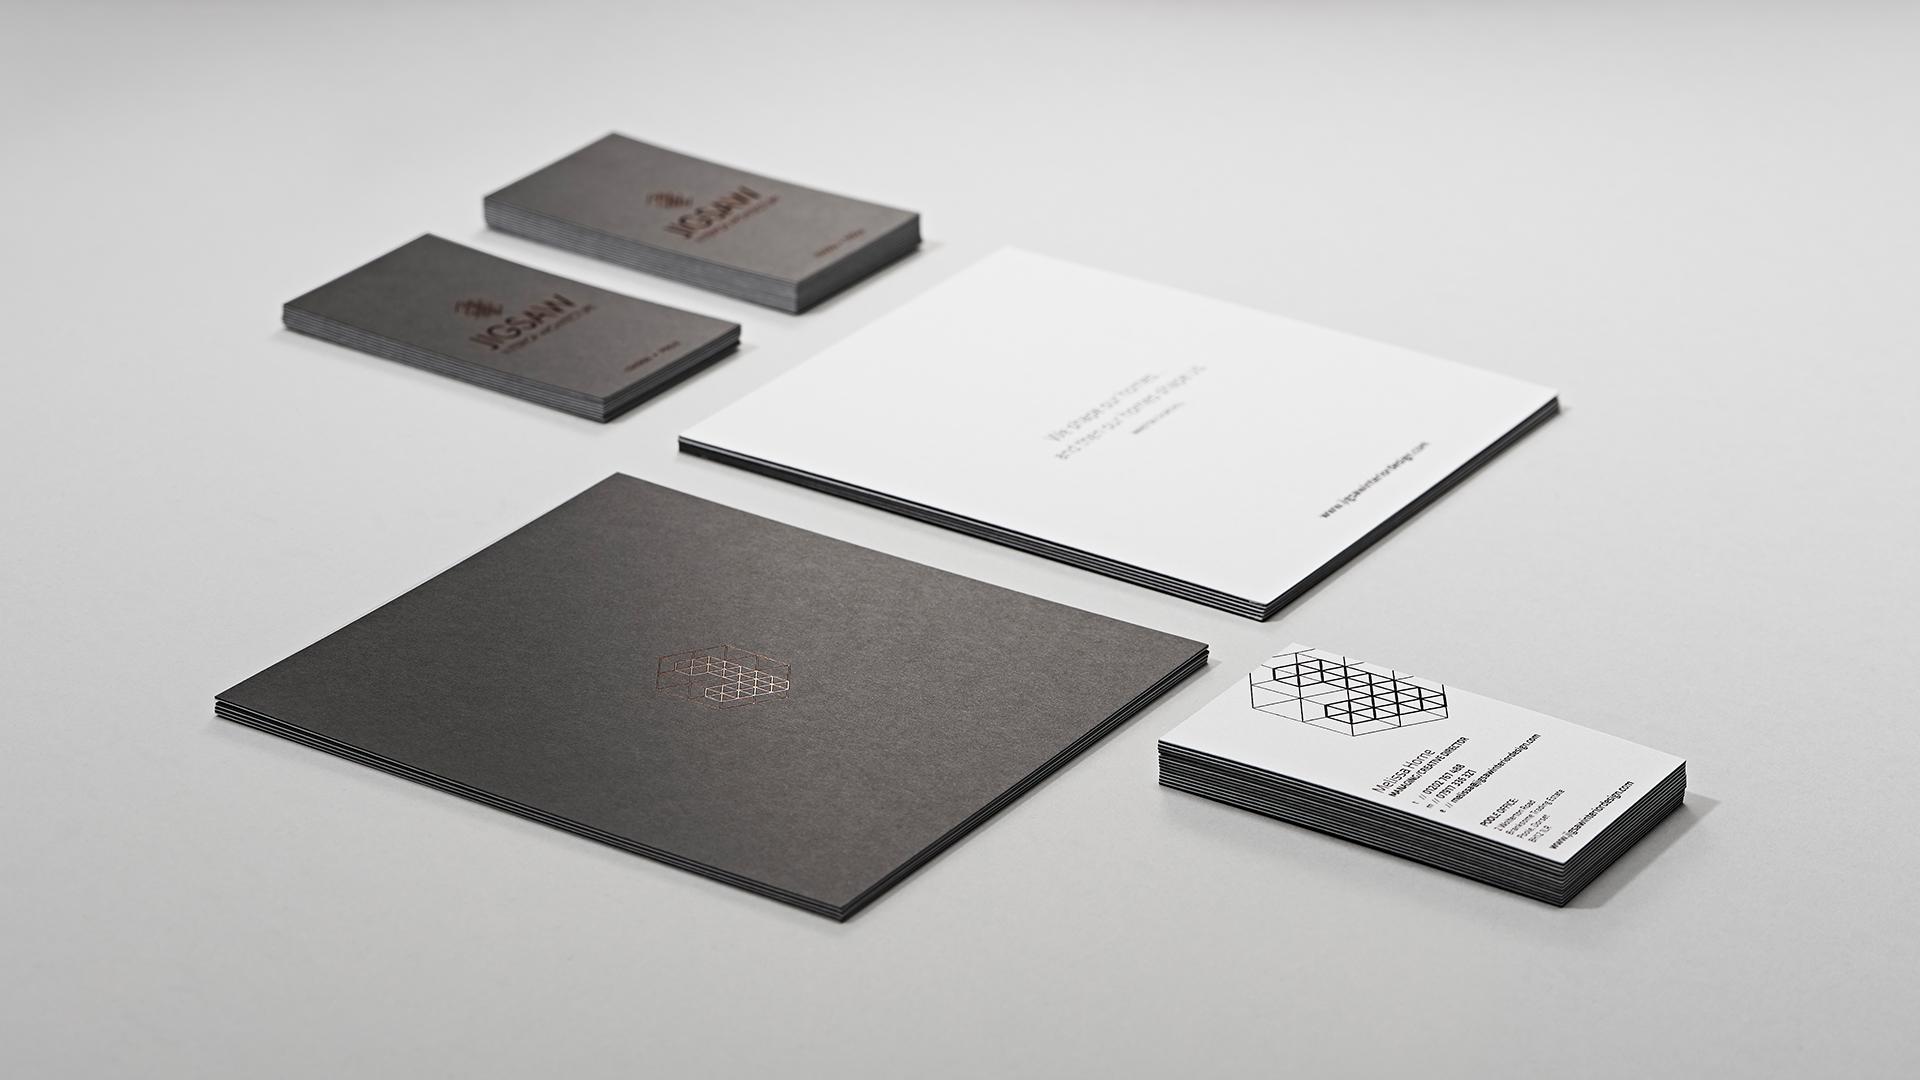 Jigsaw Interior Architecture   We Are 778 Bournemouth Poole Branding Graphic Design Web Development Creative Agency